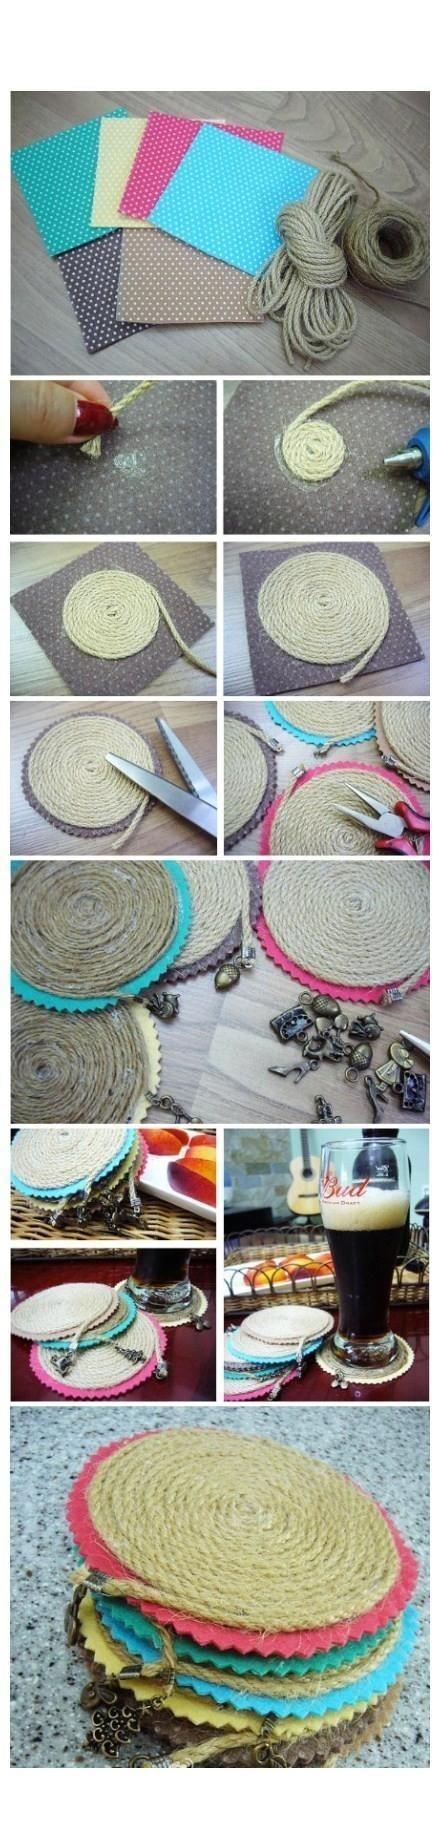 Make your own hemp coasters!